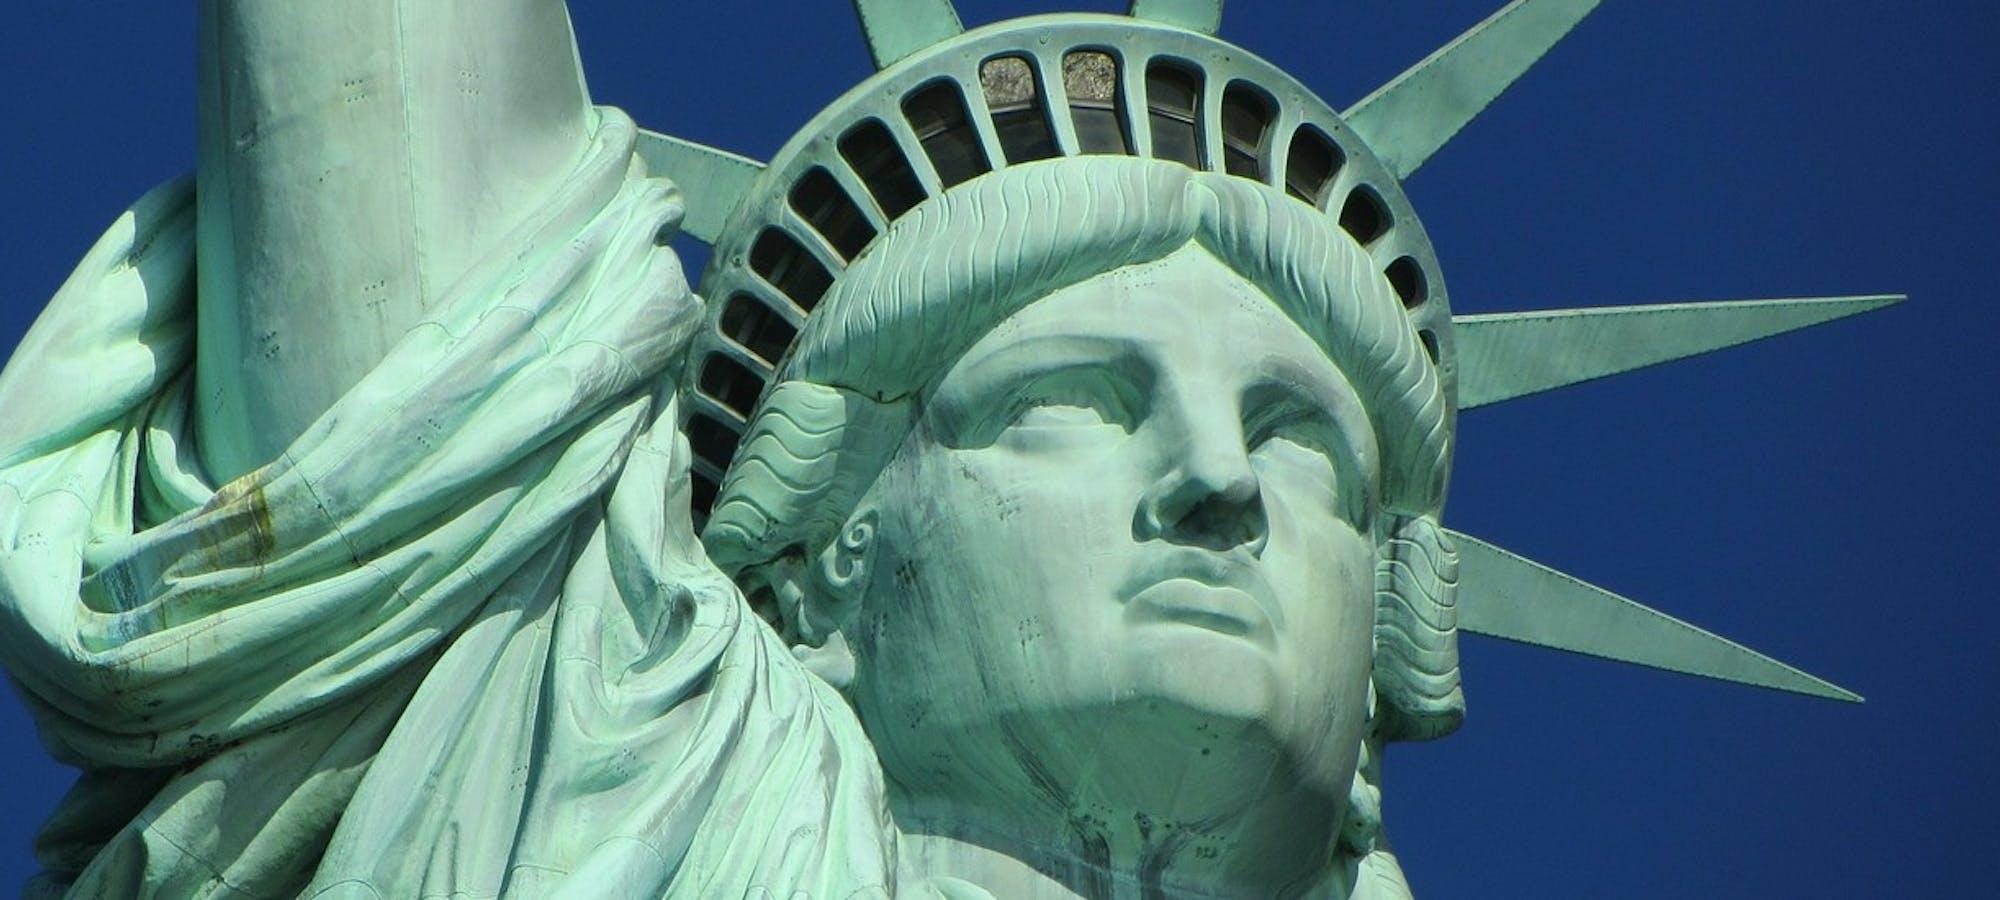 Frihetsgudinnen i New York © Ronile, Pixabay